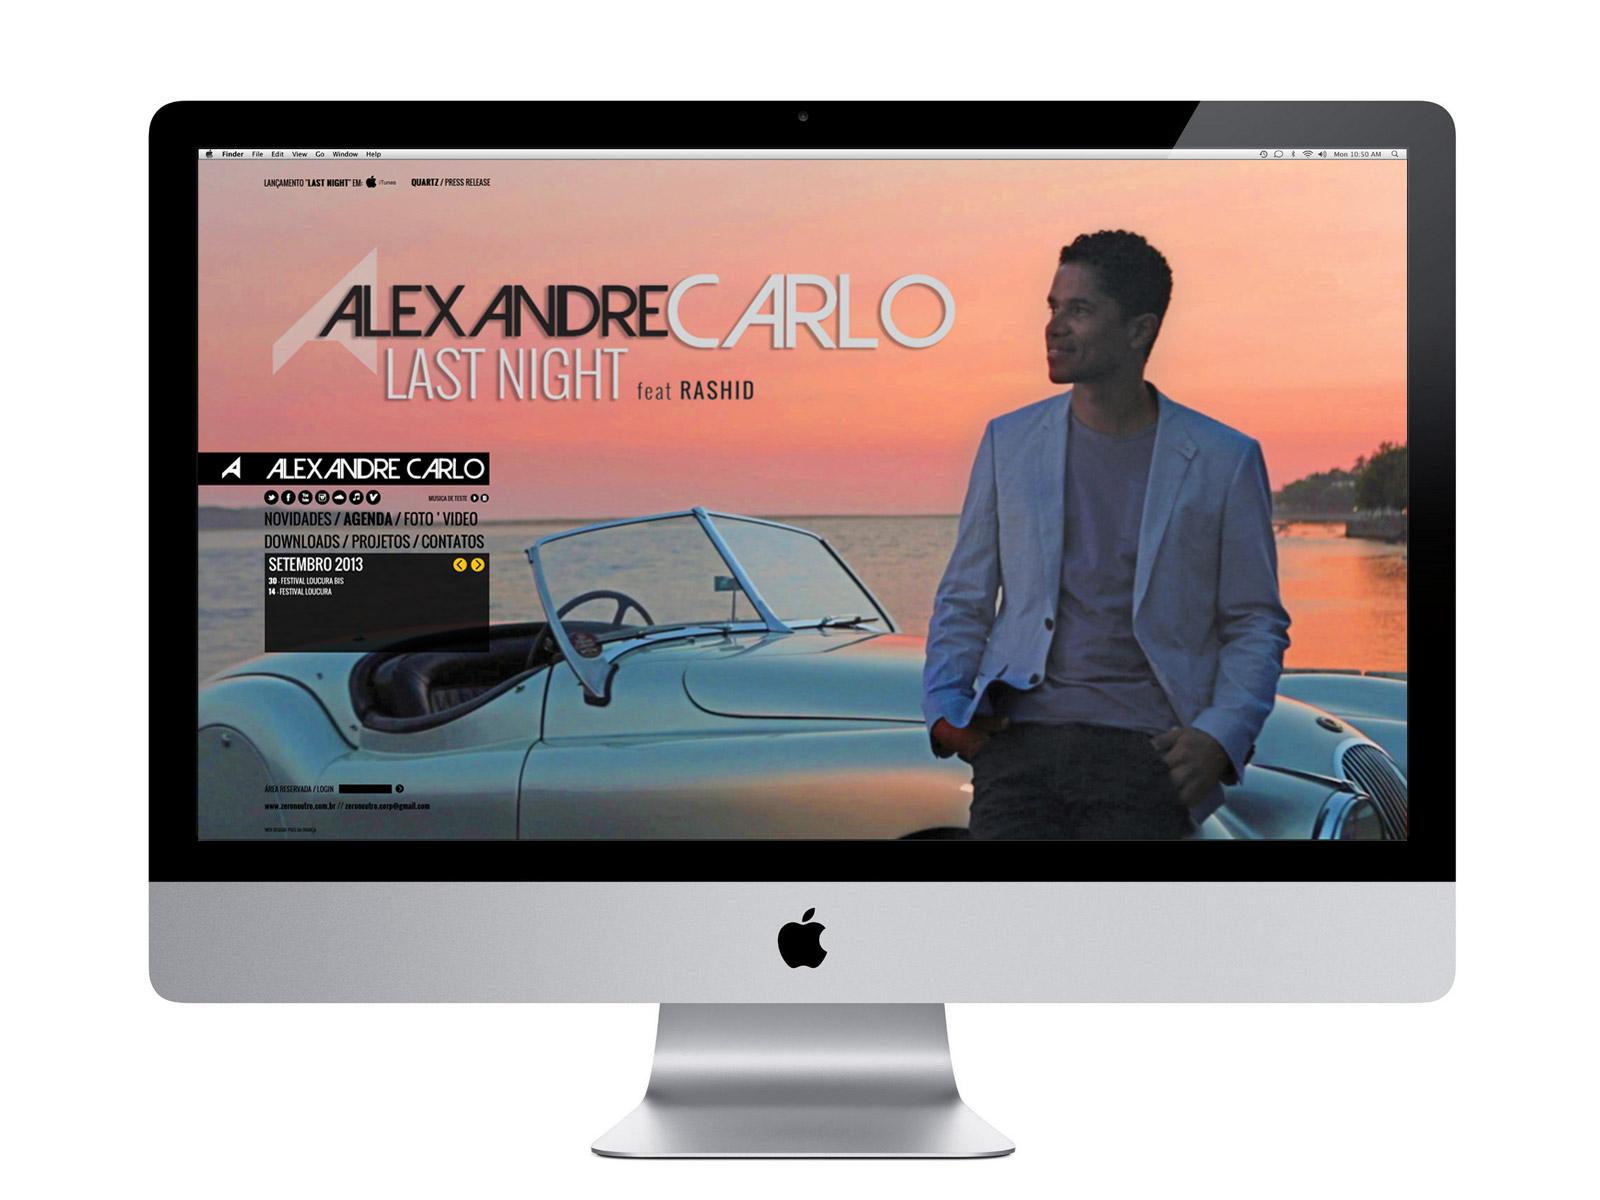 ALEXANDRE CARLO - 3